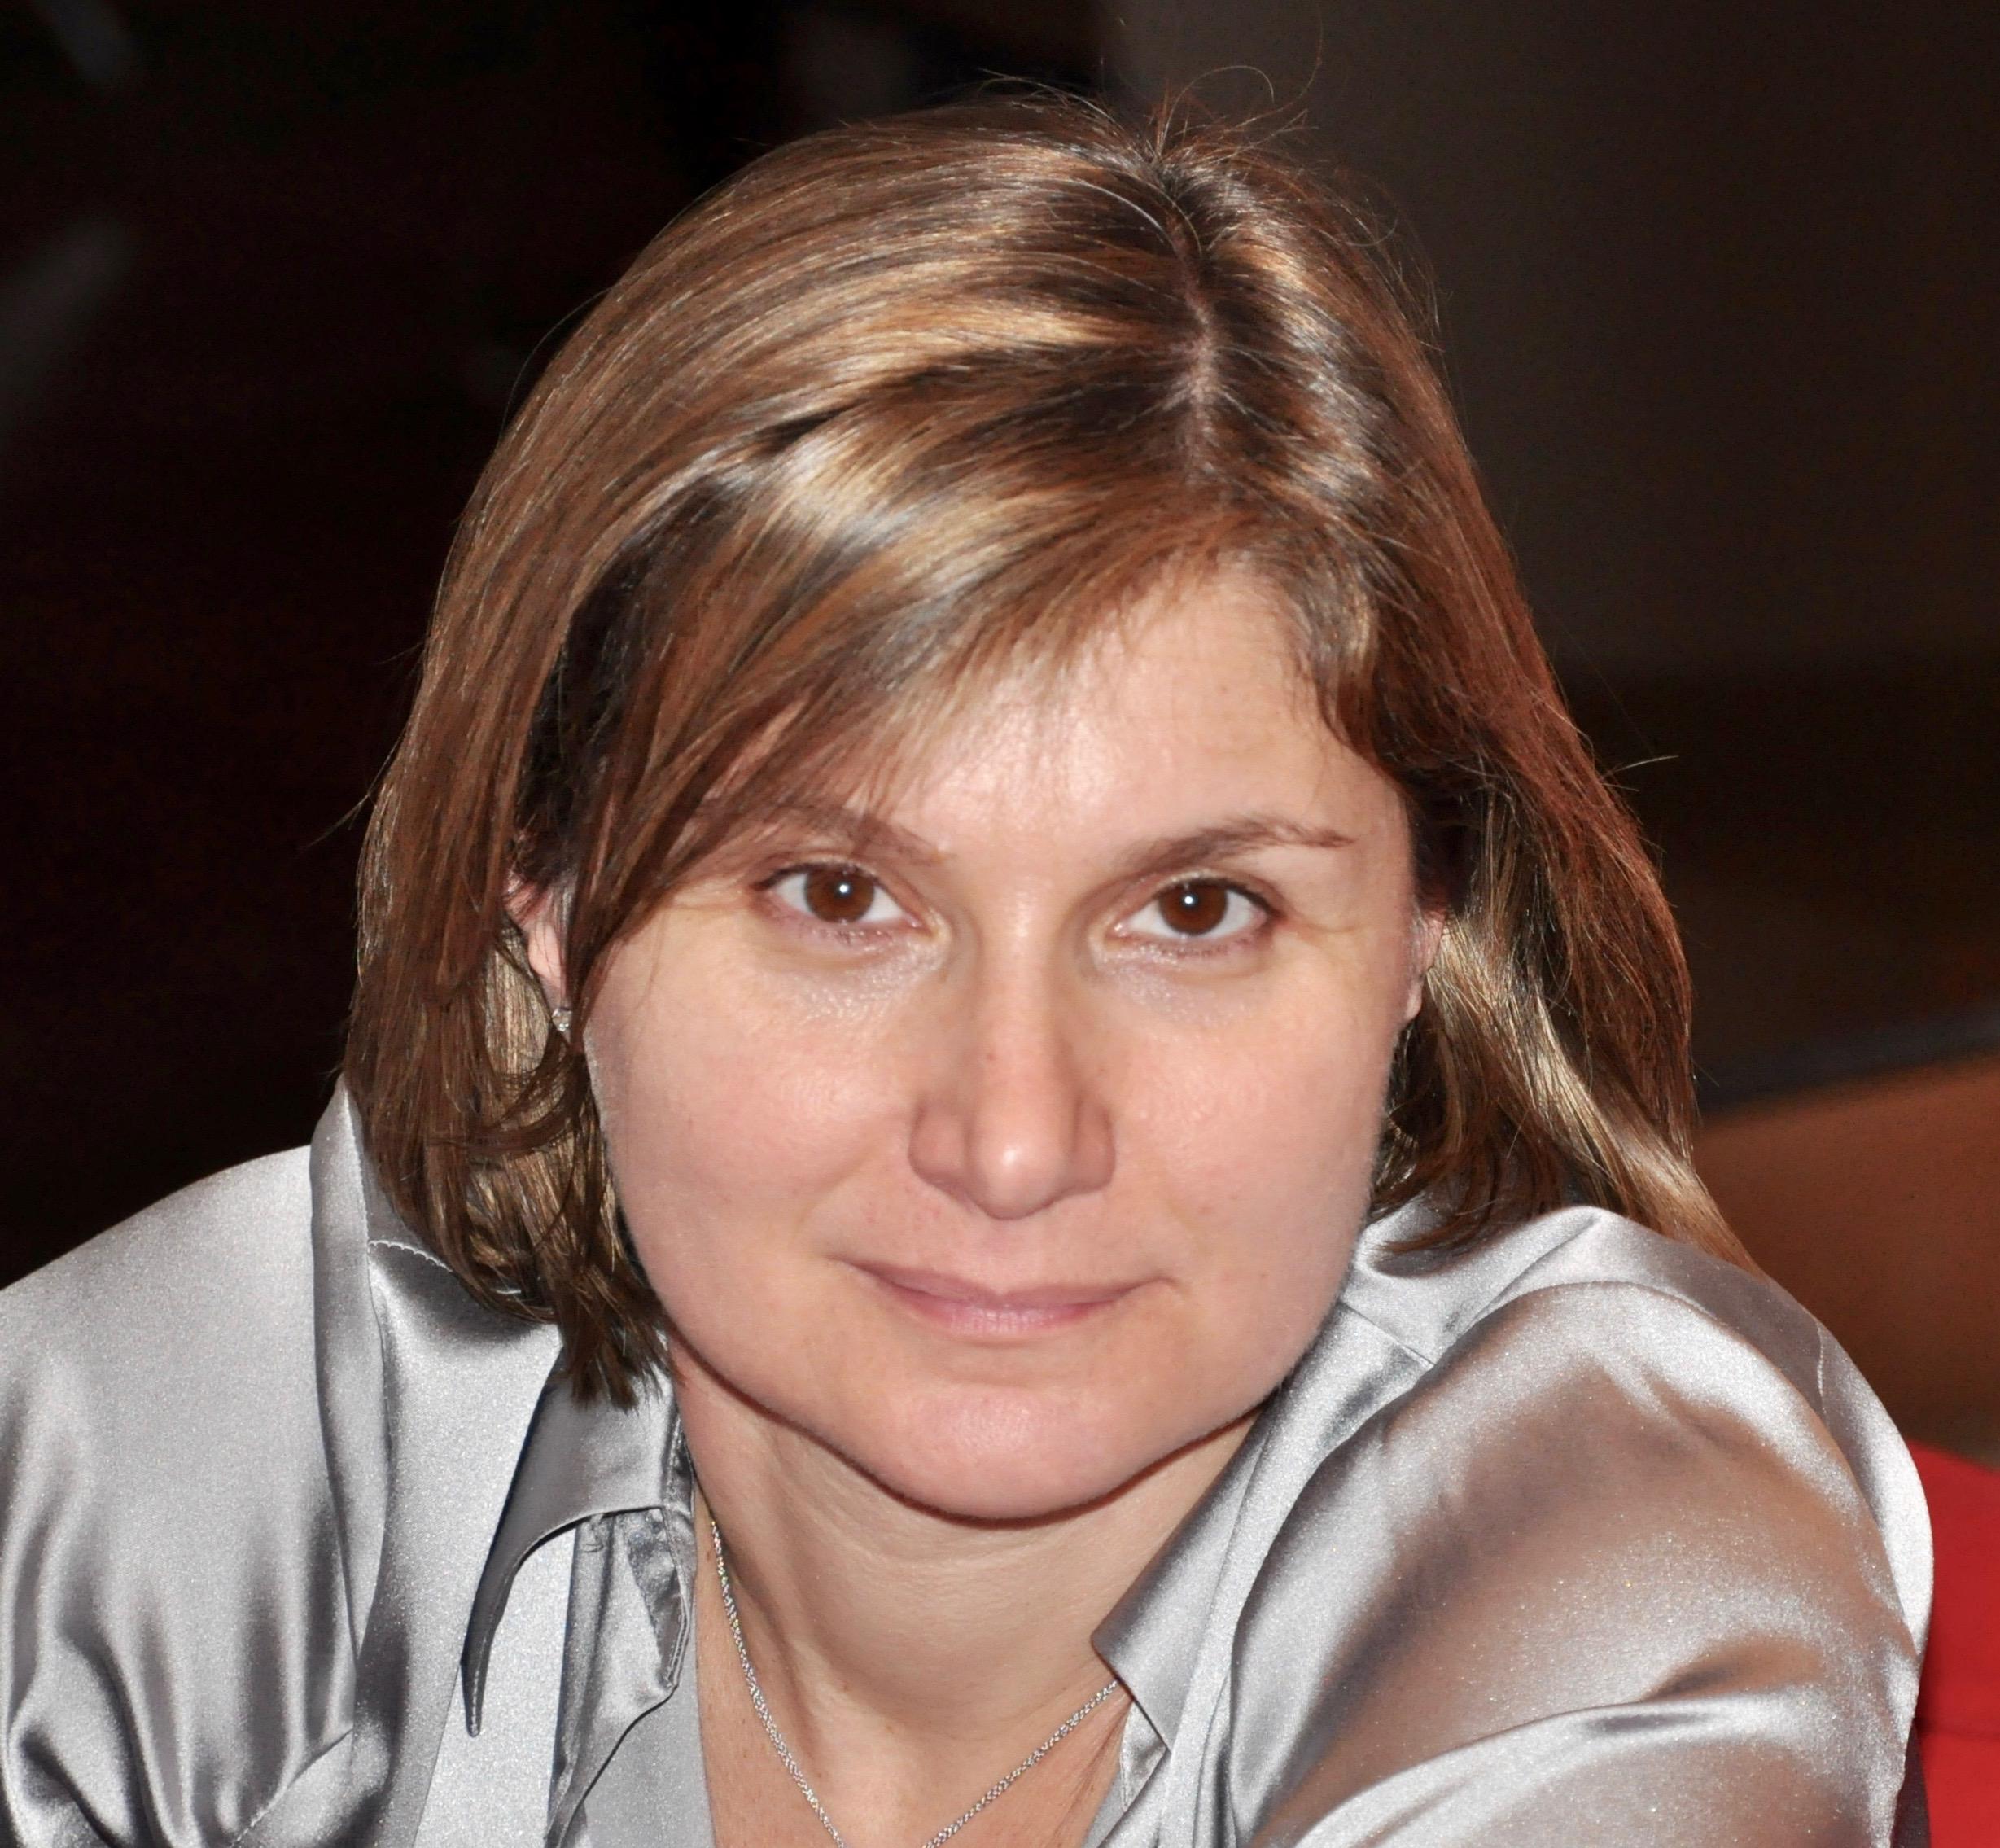 Maria Girone